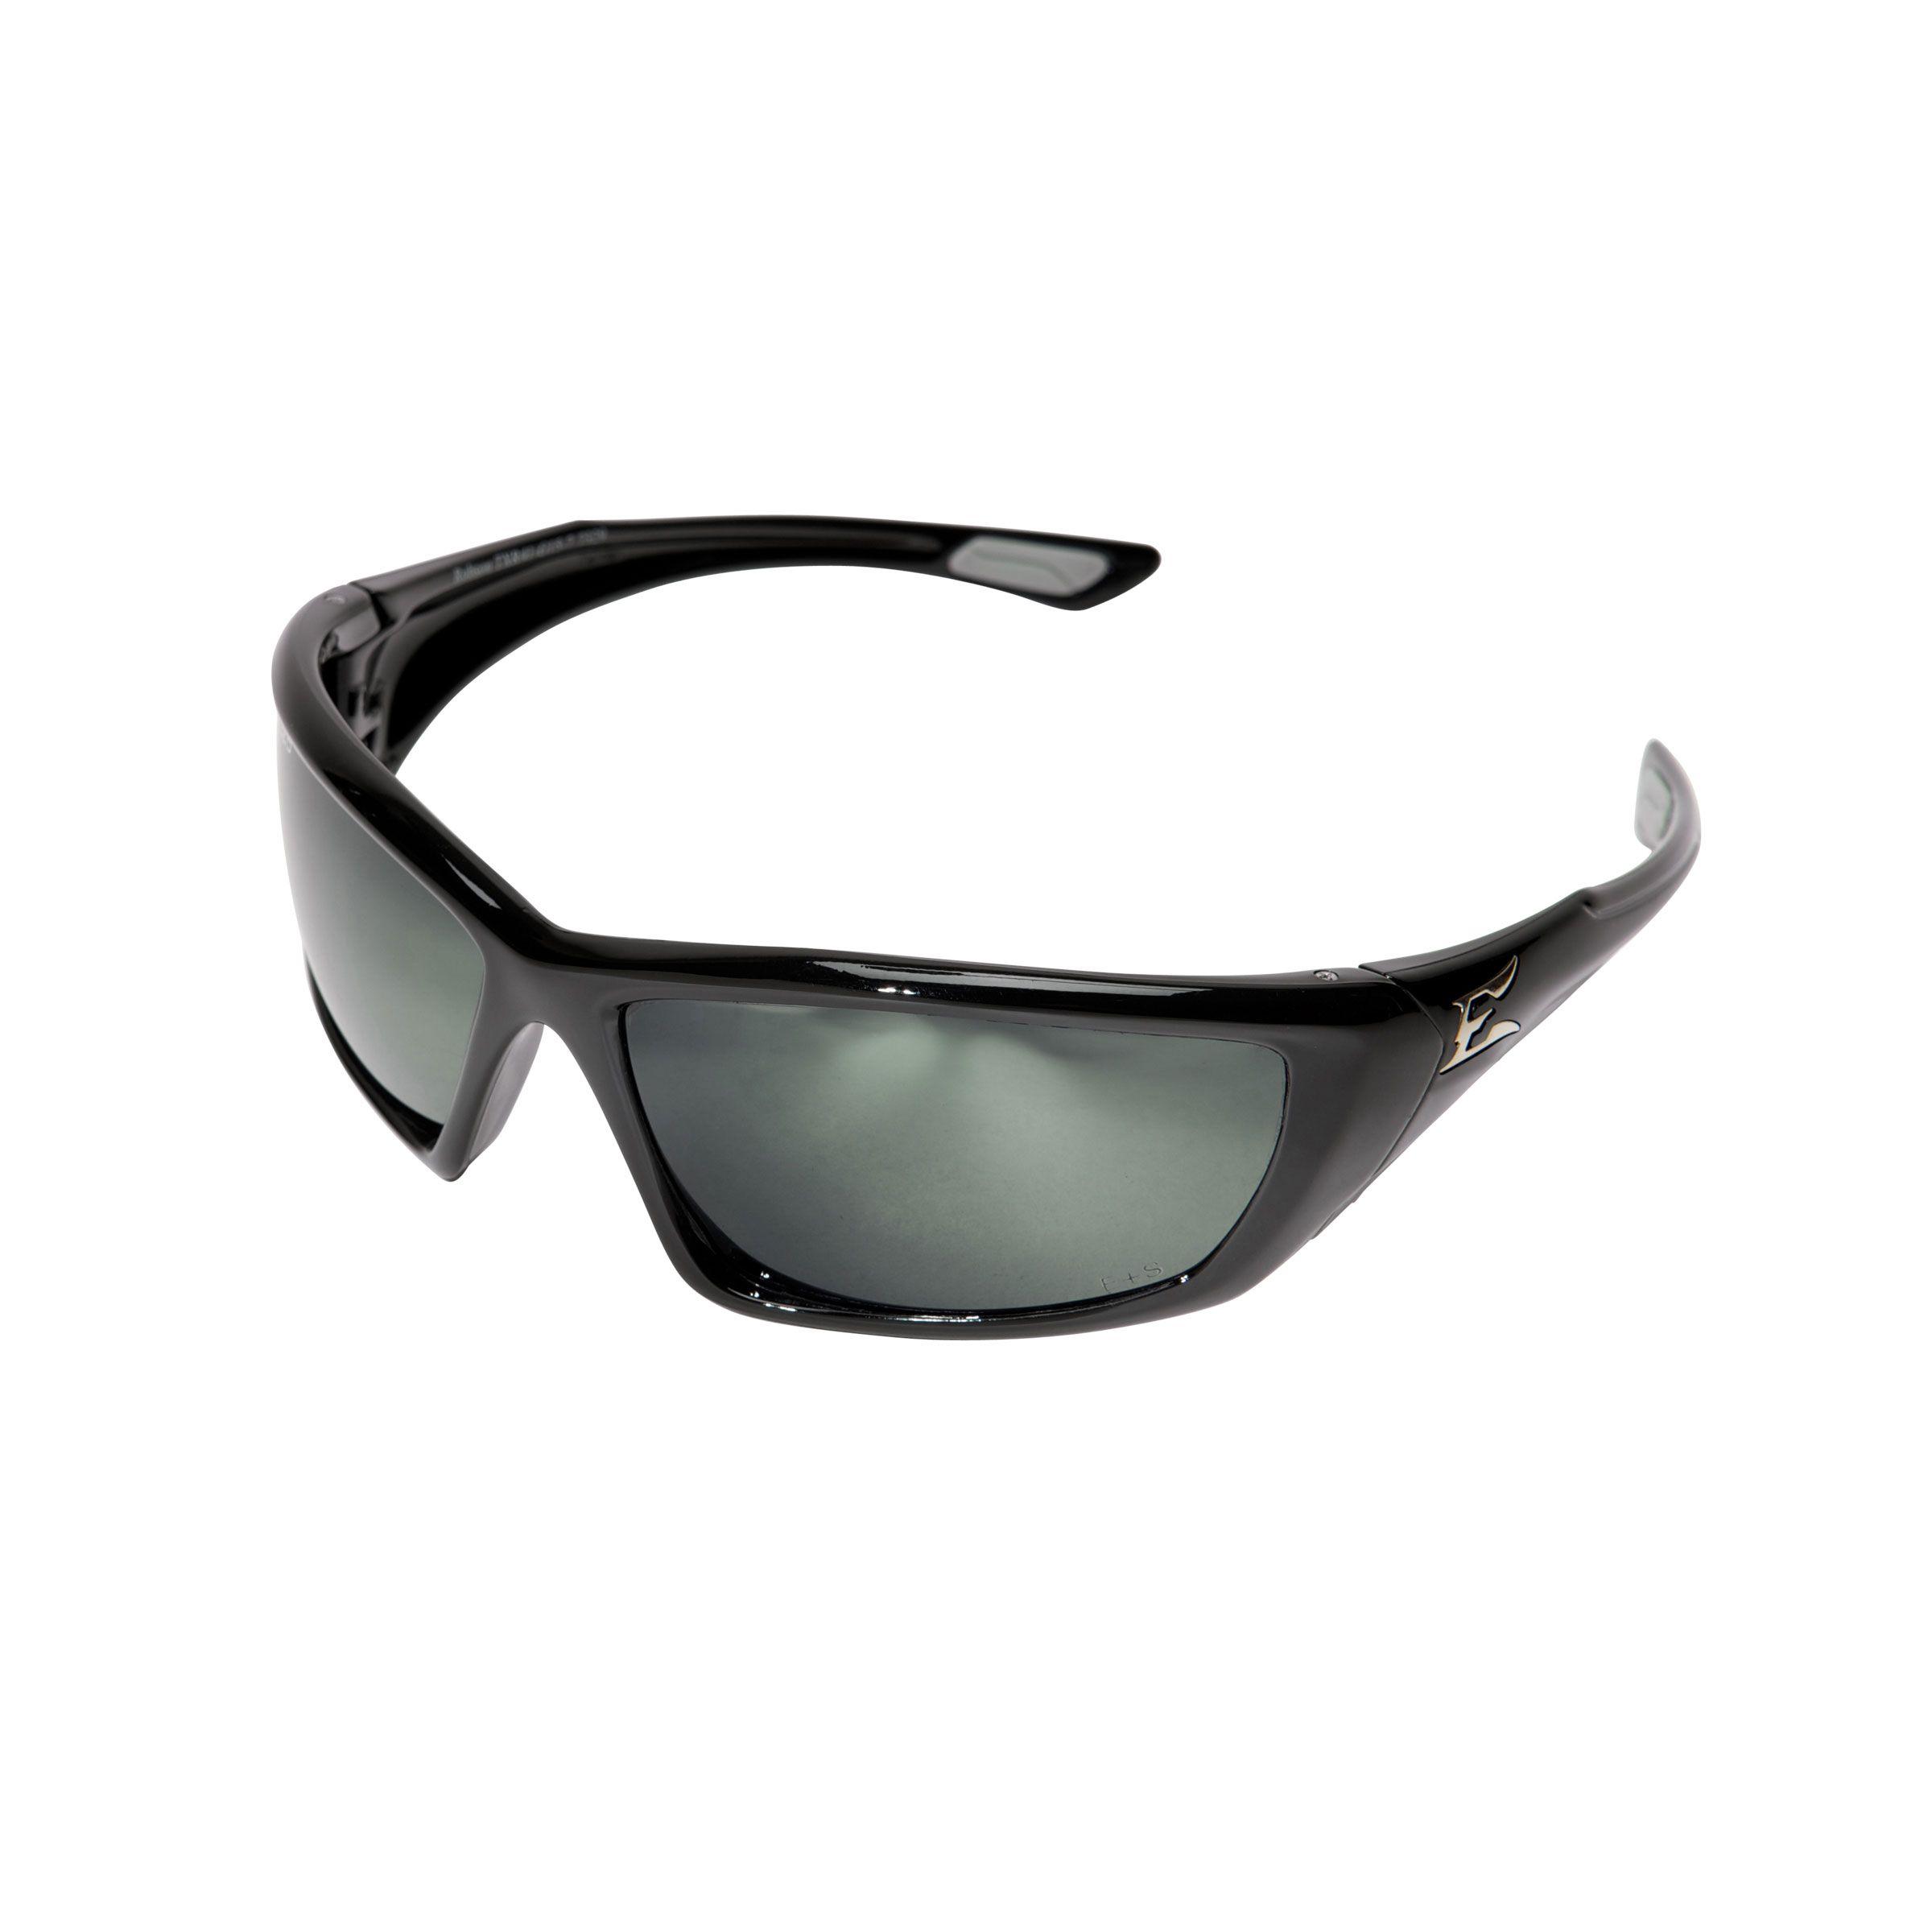 Construction fasteners glasses eyewear silver